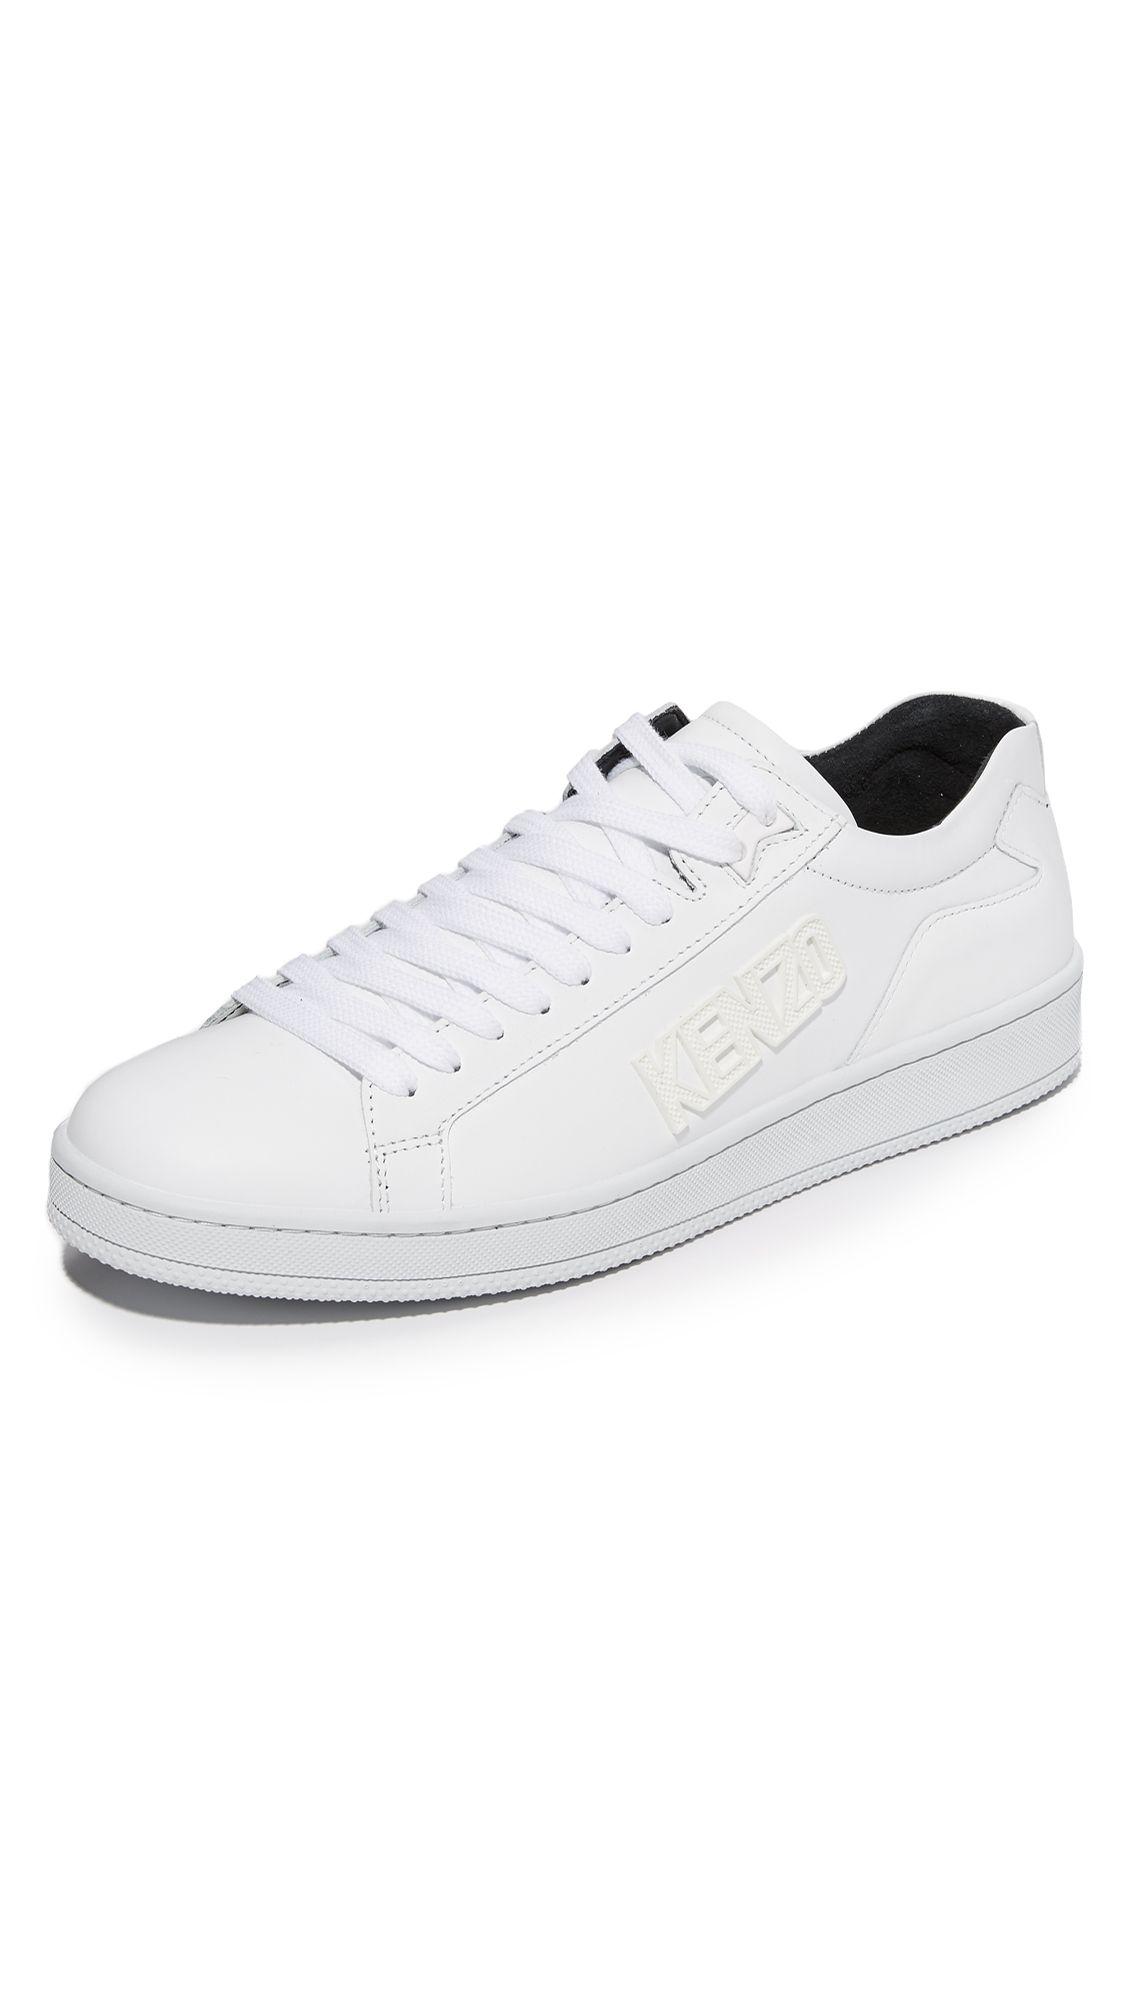 KENZO Tennix Lace Up Sneakers. #kenzo #shoes #sneakers